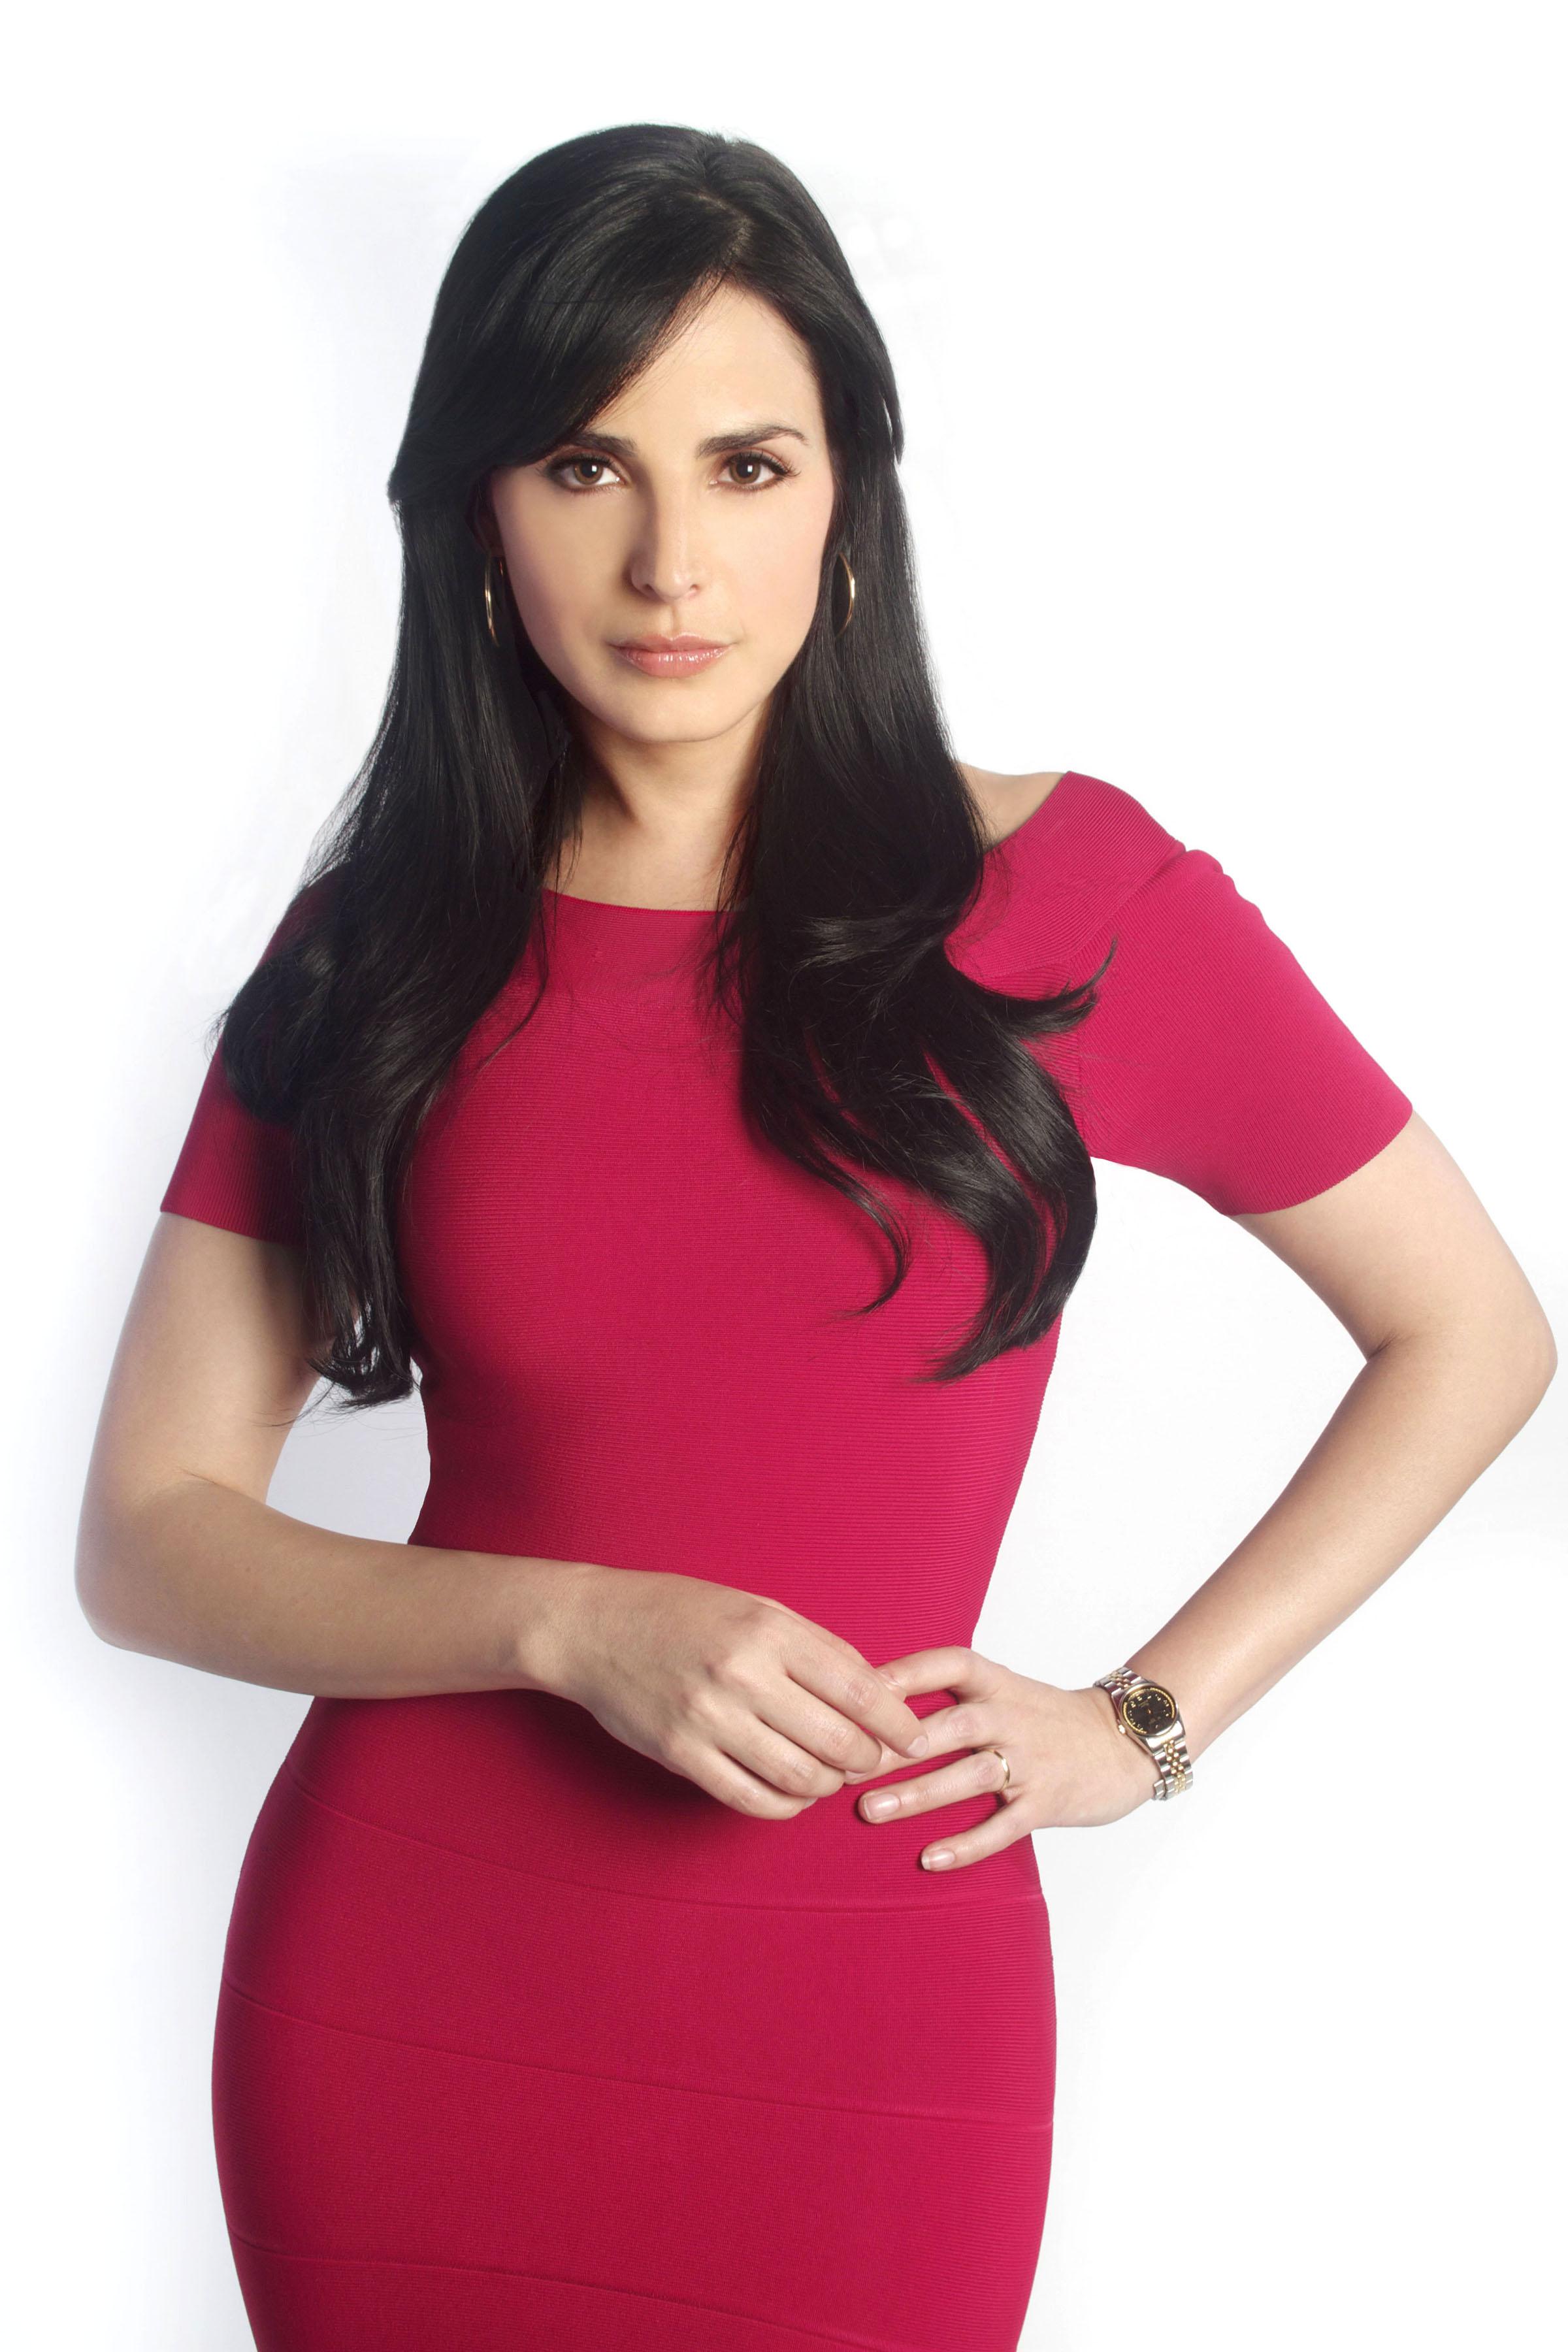 Ximena Herrera como Ximena Letrán_002 copia